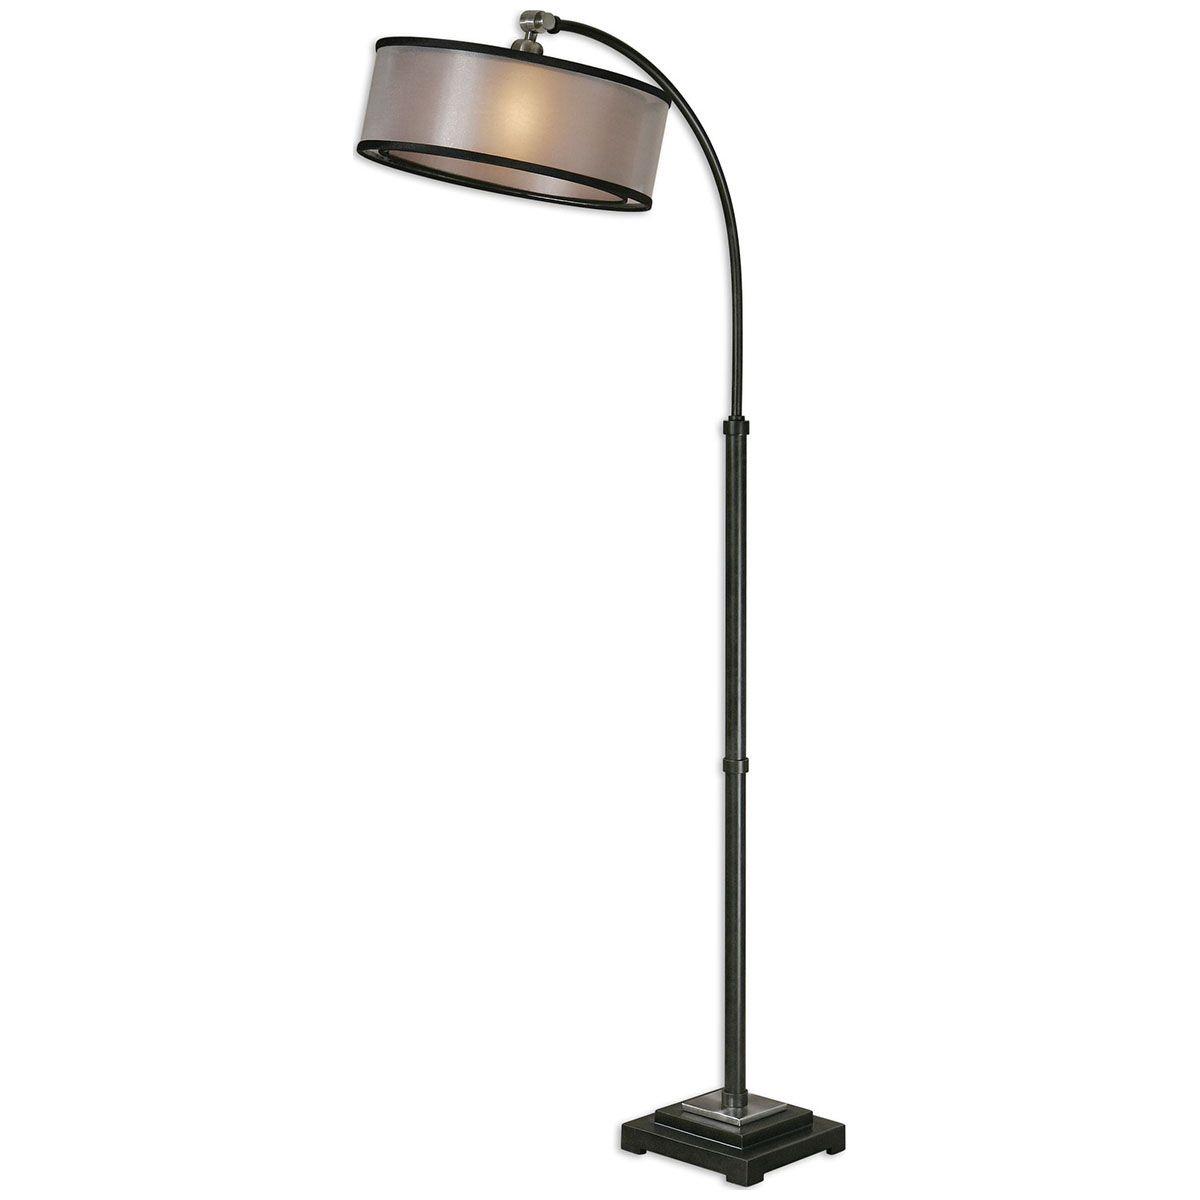 Uttermost Worland Arc Floor Lamp 28591 1 Arc Floor Lamps regarding sizing 1200 X 1200